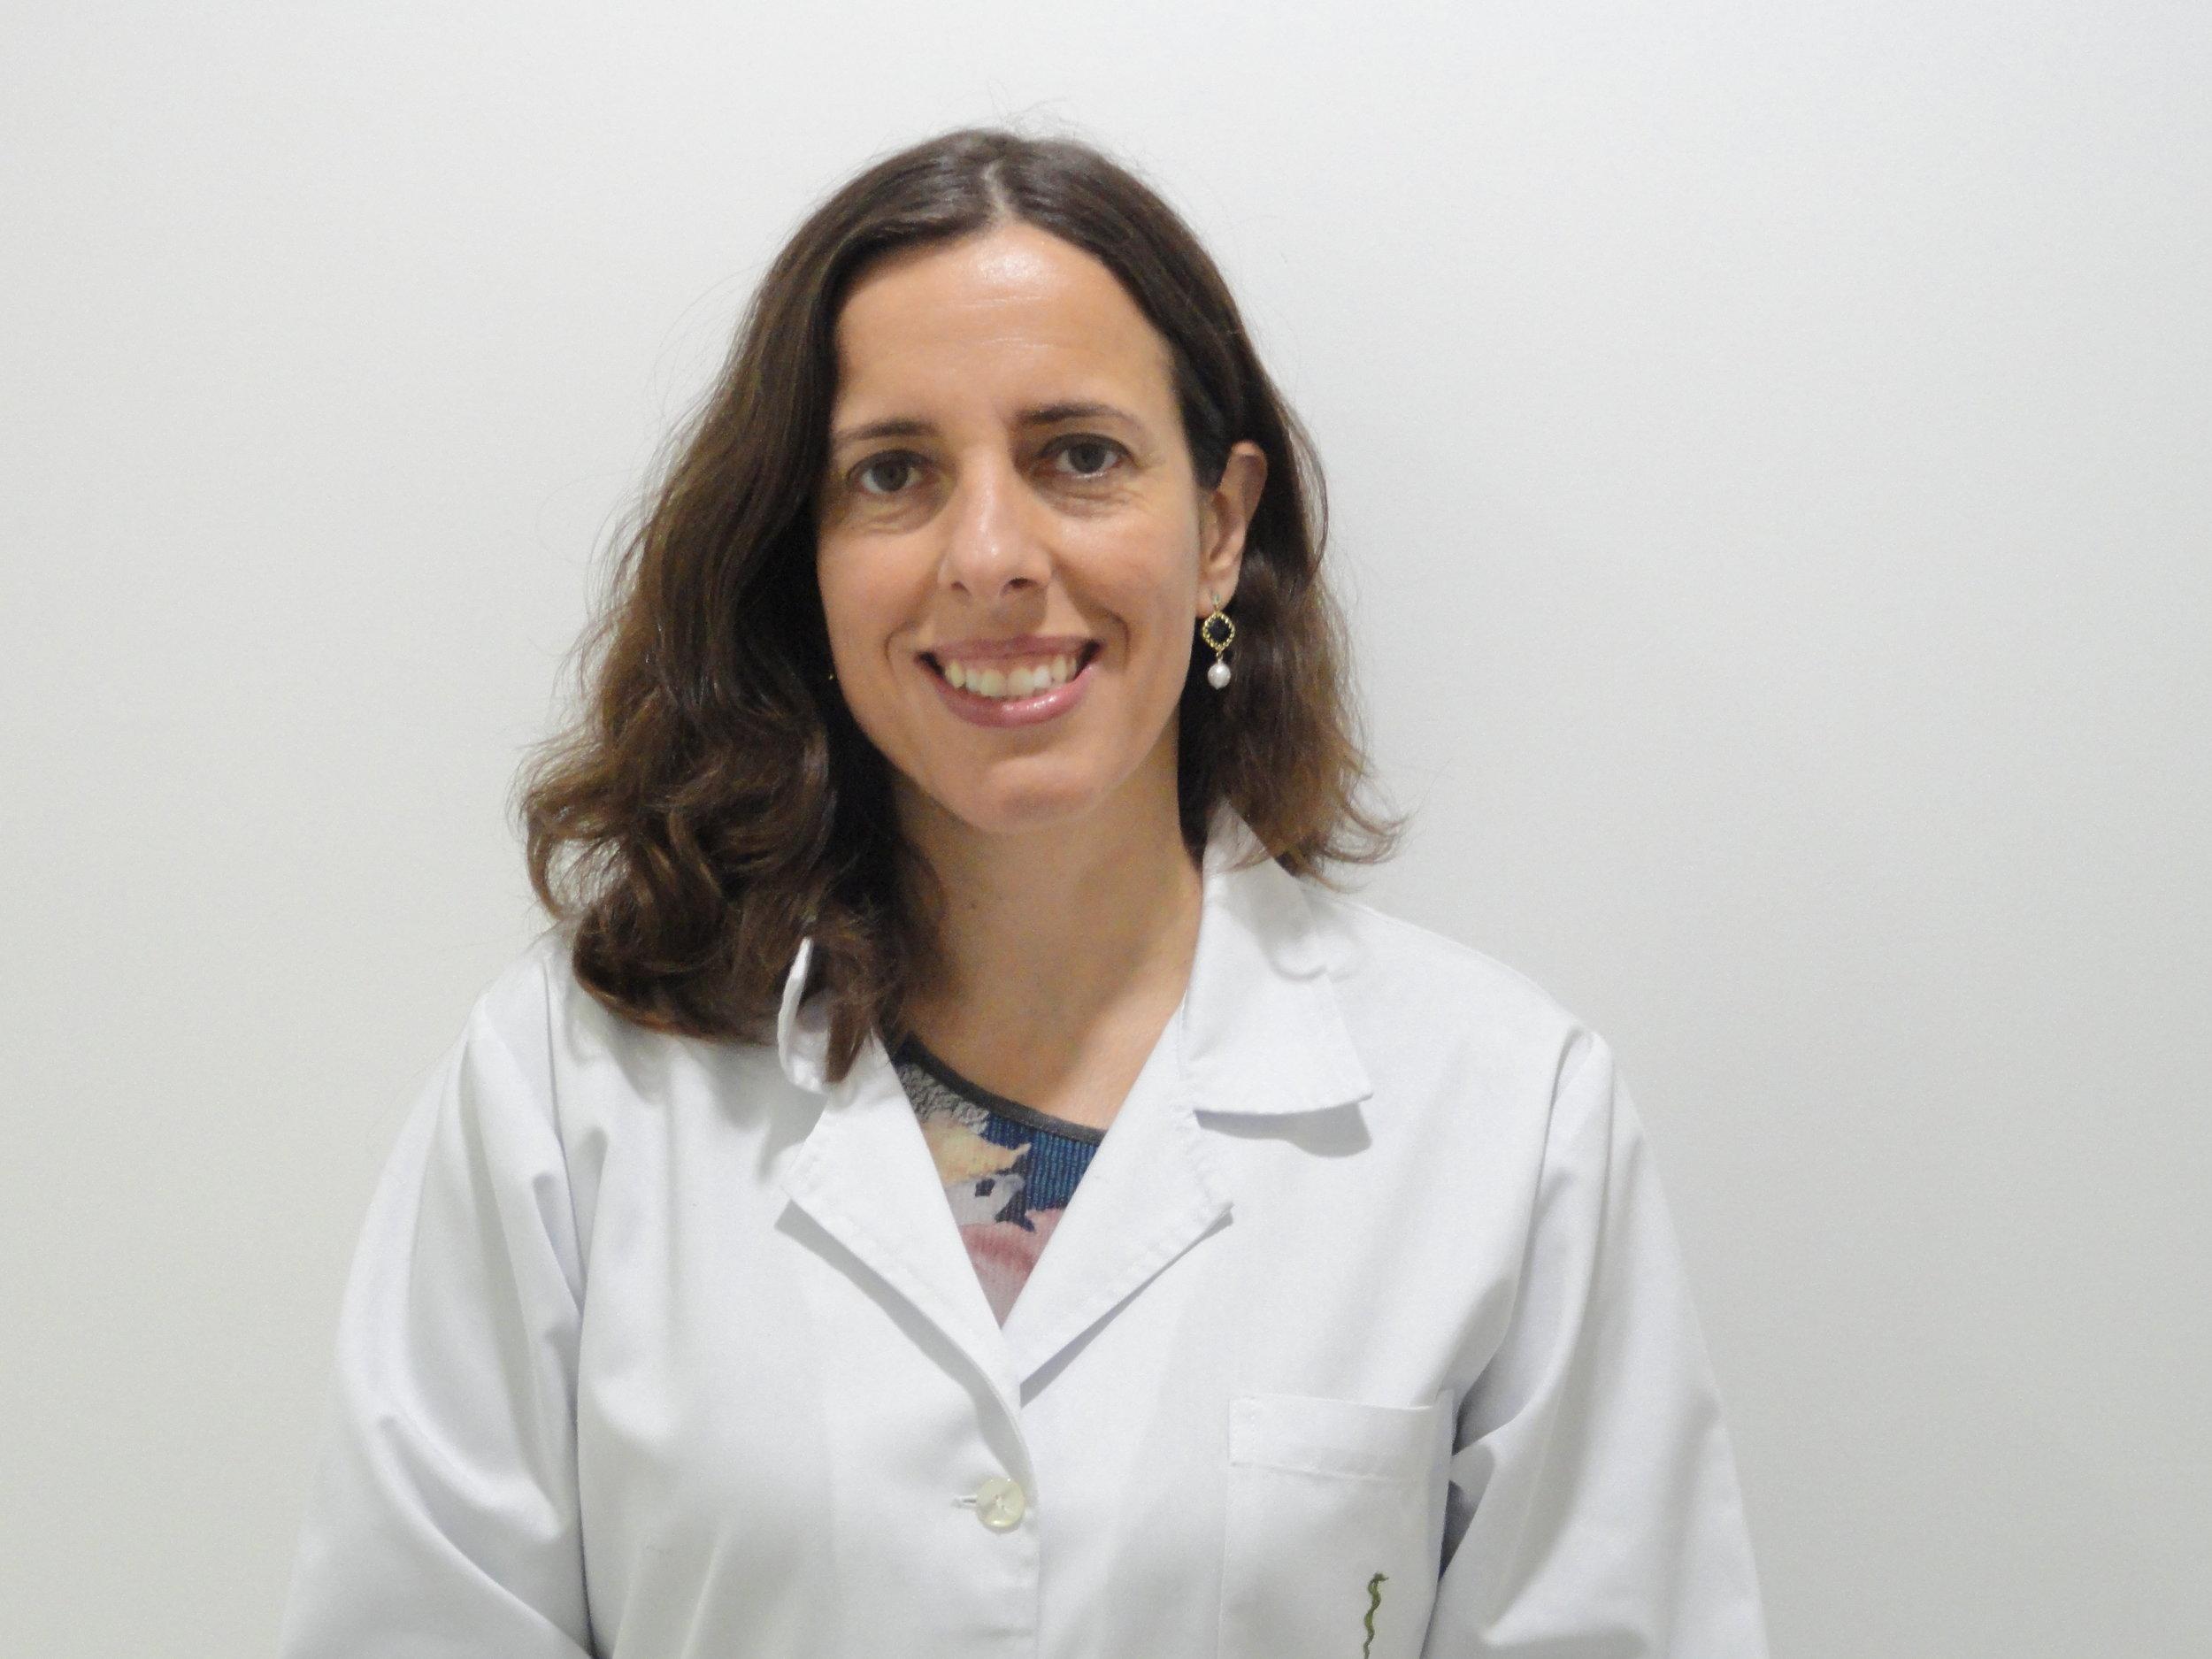 Dra. Rita Duarte - Cardiologia (1).JPG